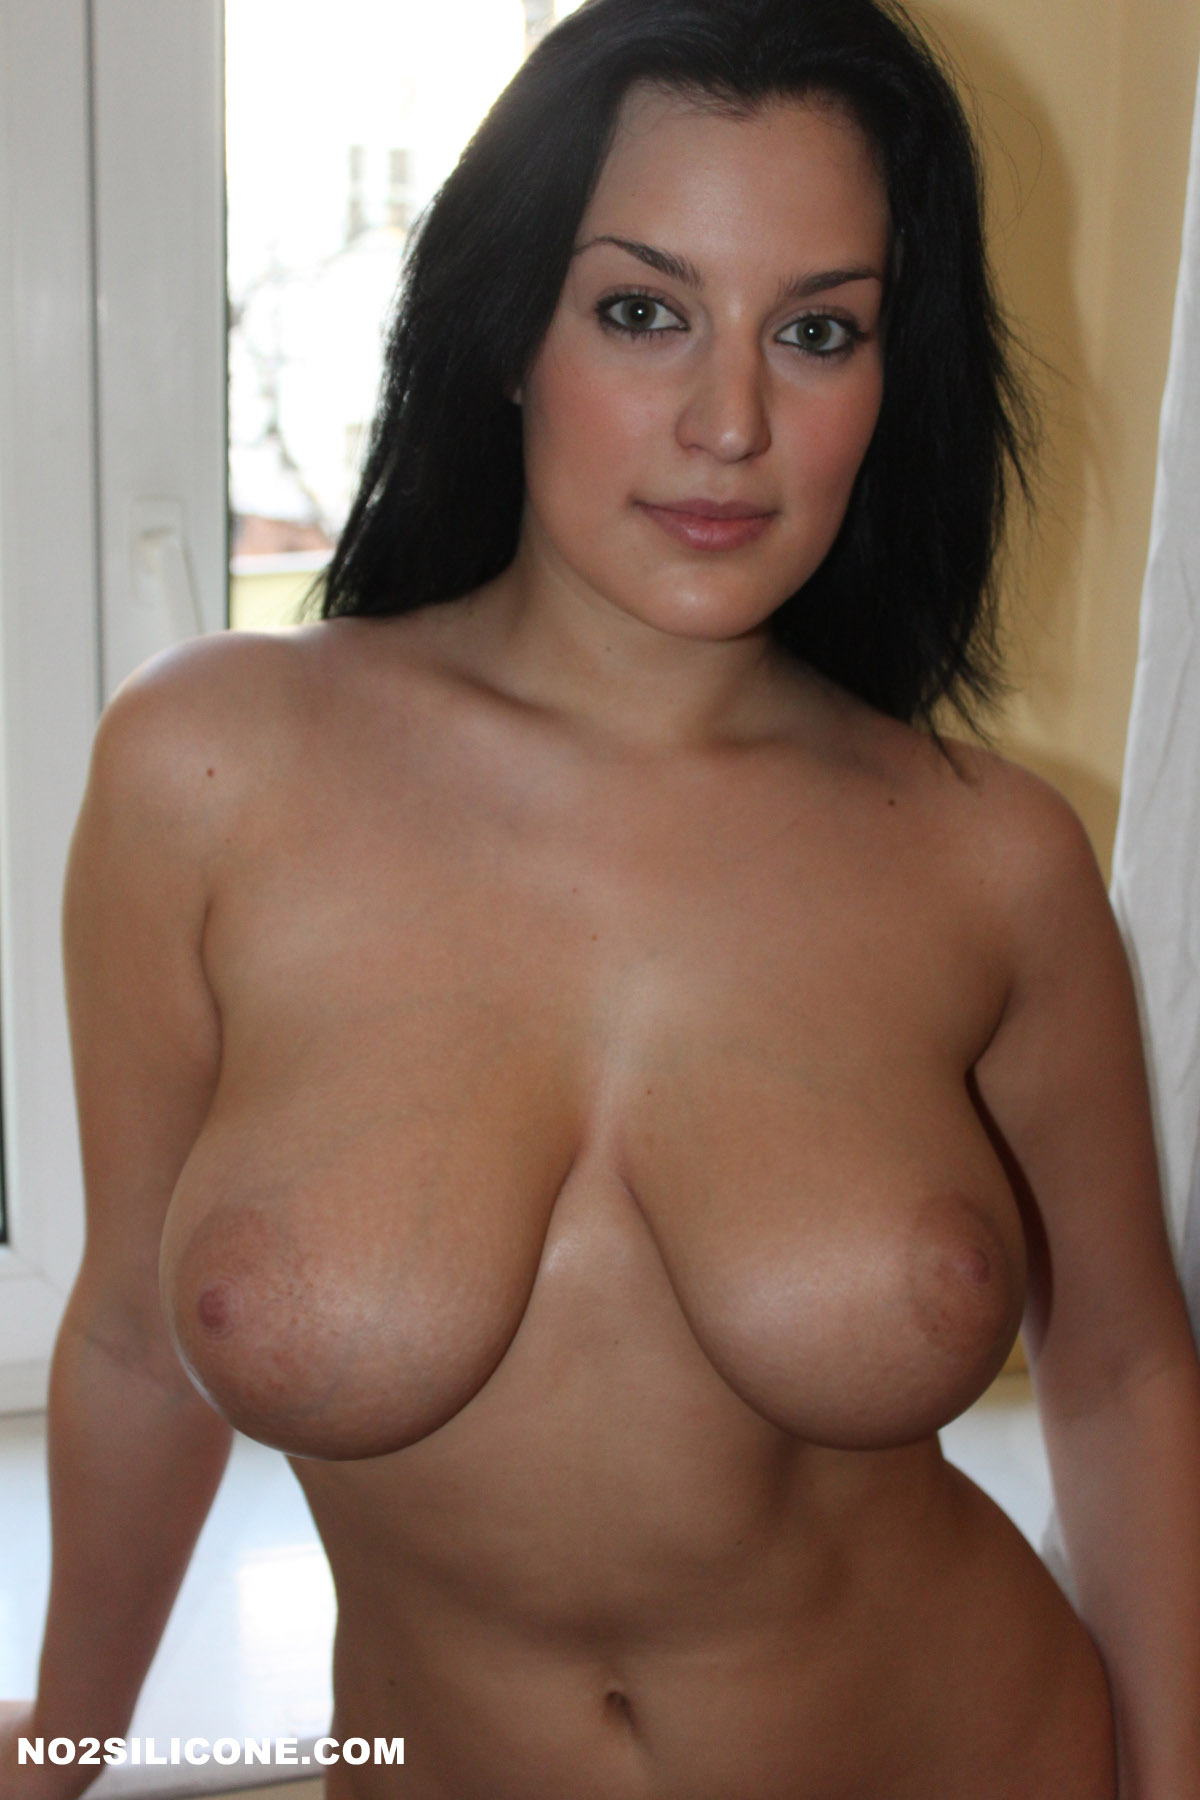 Brunette busty latina natural authoritative